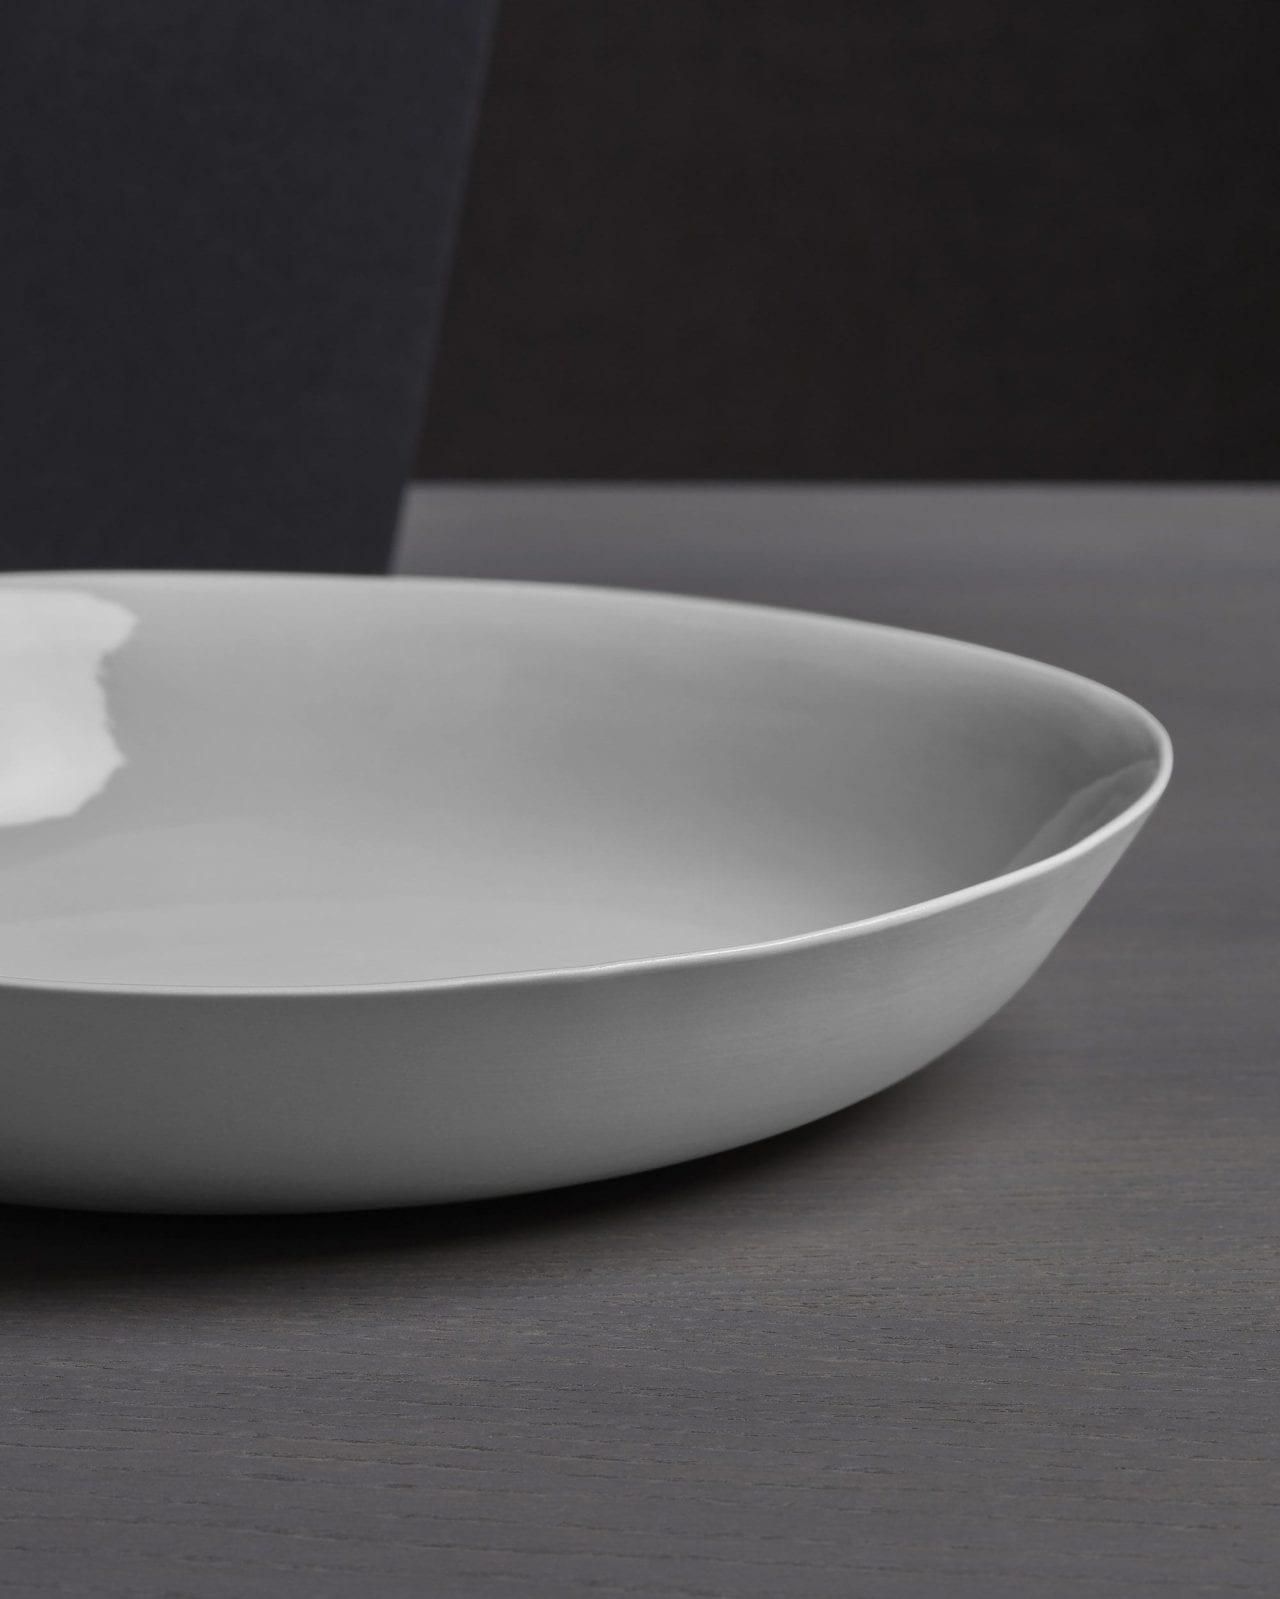 Society Limonta — Onda Flat Bottom Dish — Bianco